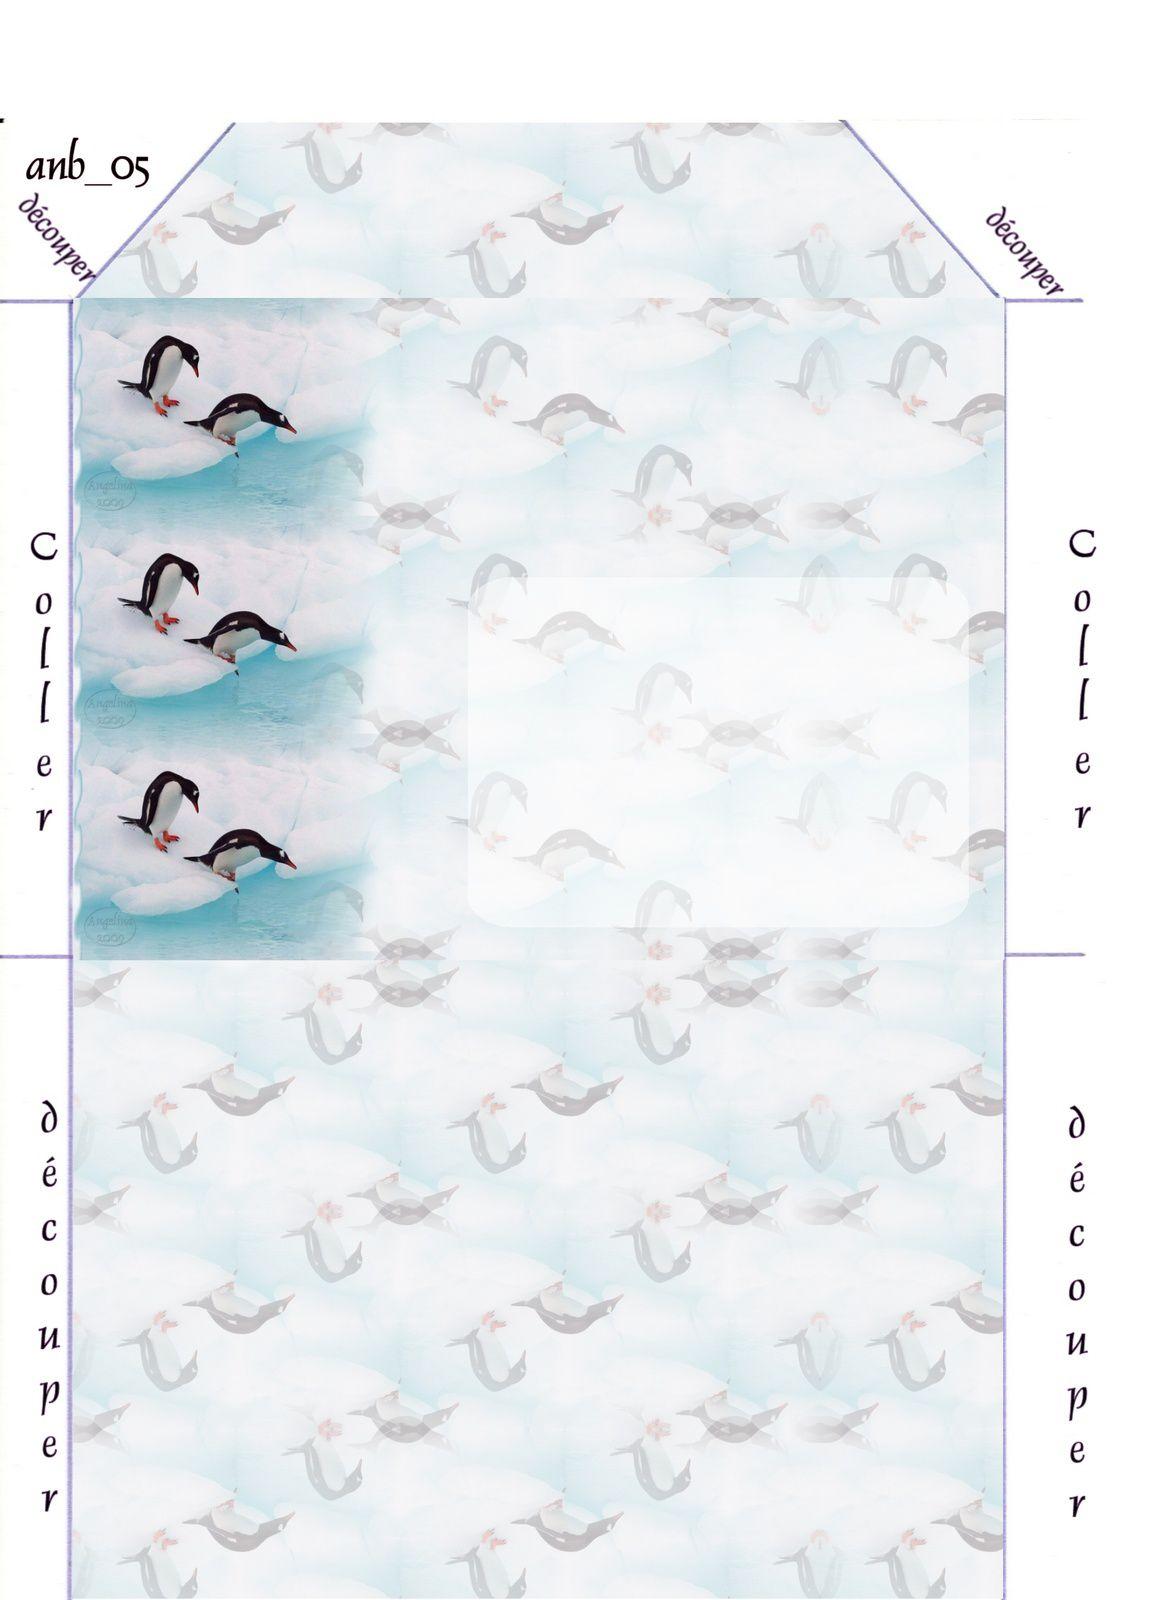 Pinguins Incredimail &amp&#x3B; Papier A4 h l &amp&#x3B; outlook &amp&#x3B; enveloppe &amp&#x3B; 2 cartes A5 &amp&#x3B; signets 3 langues    anm_micheline_animaux_07